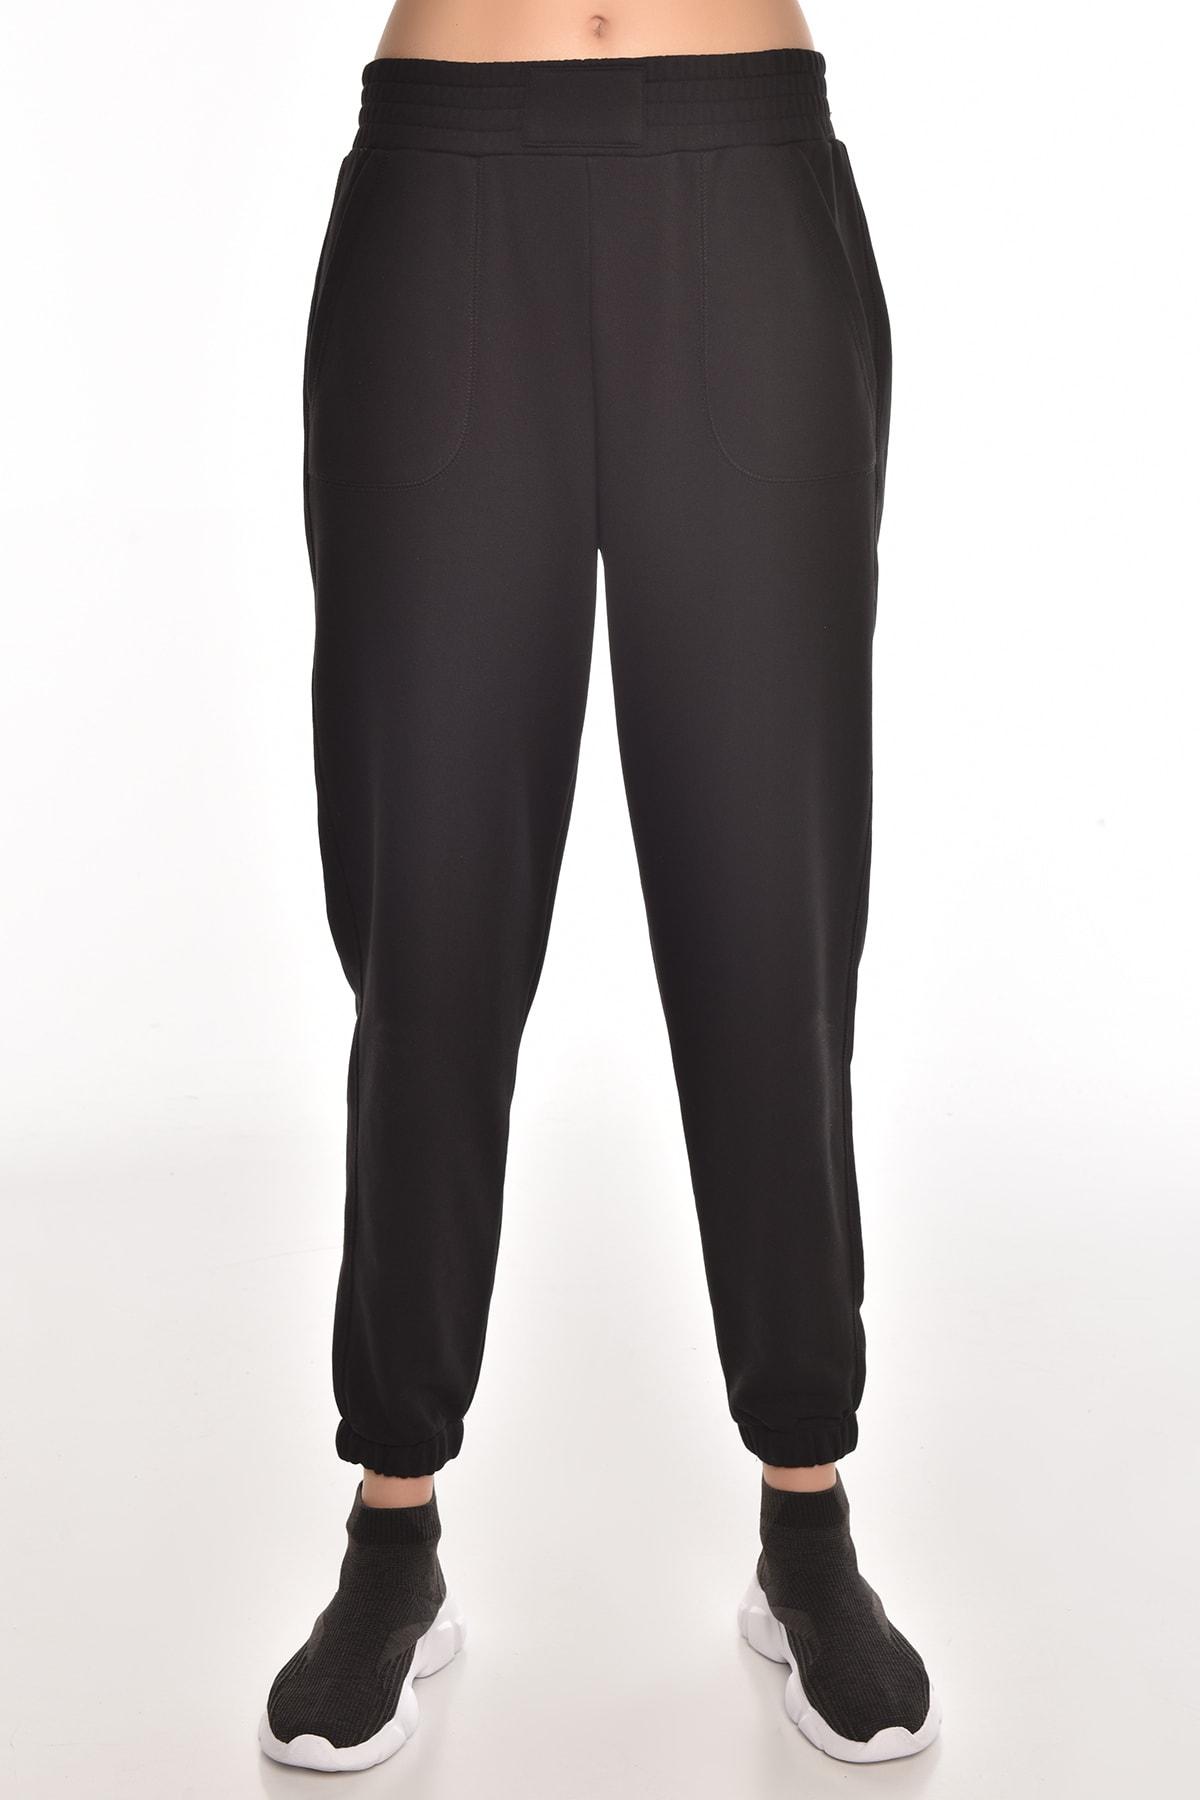 bilcee Siyah Kadın Jogger Eşofman Altı Gw-8999 1